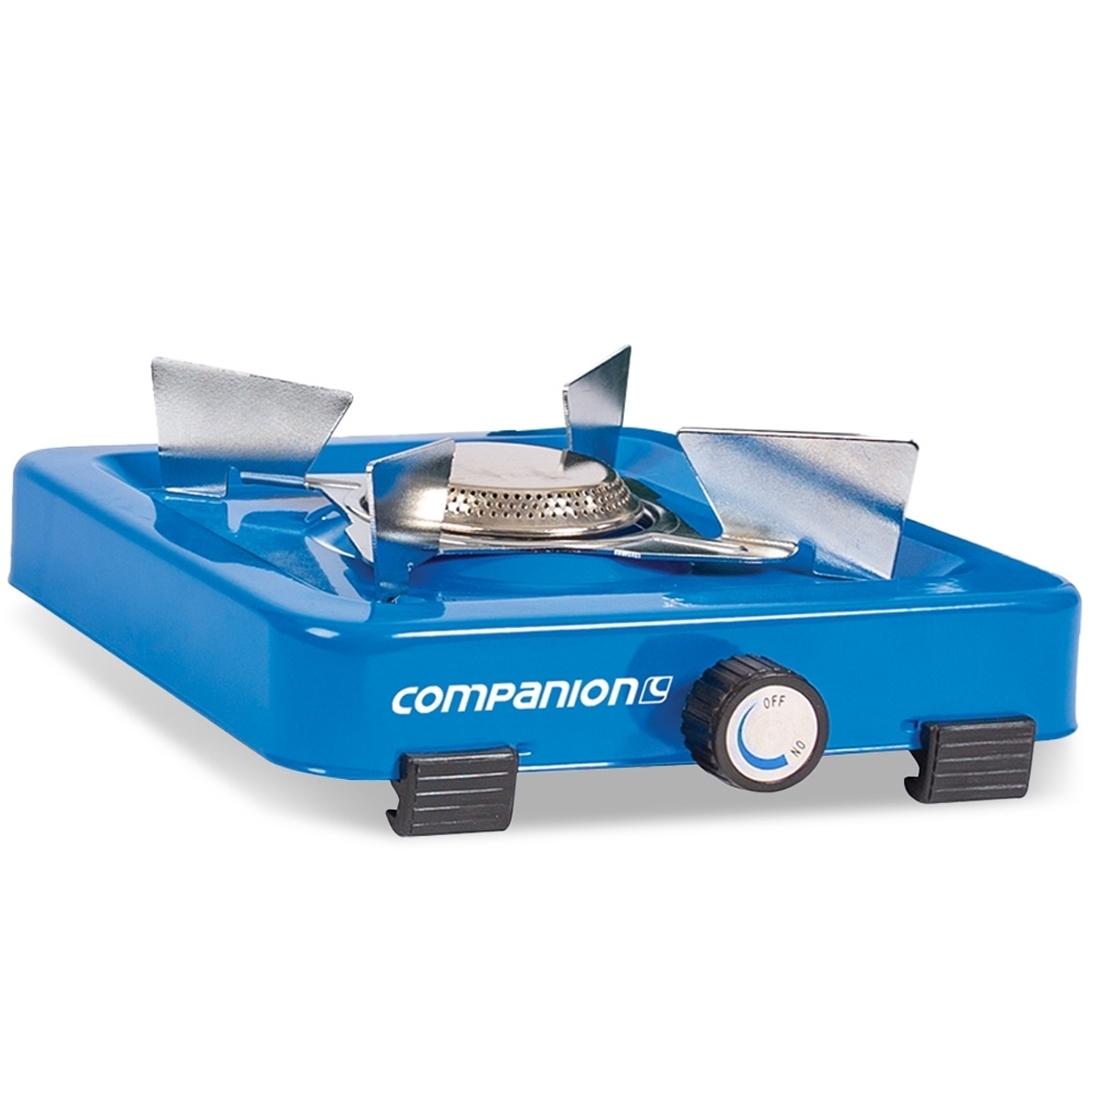 Companion Propane Single Stove